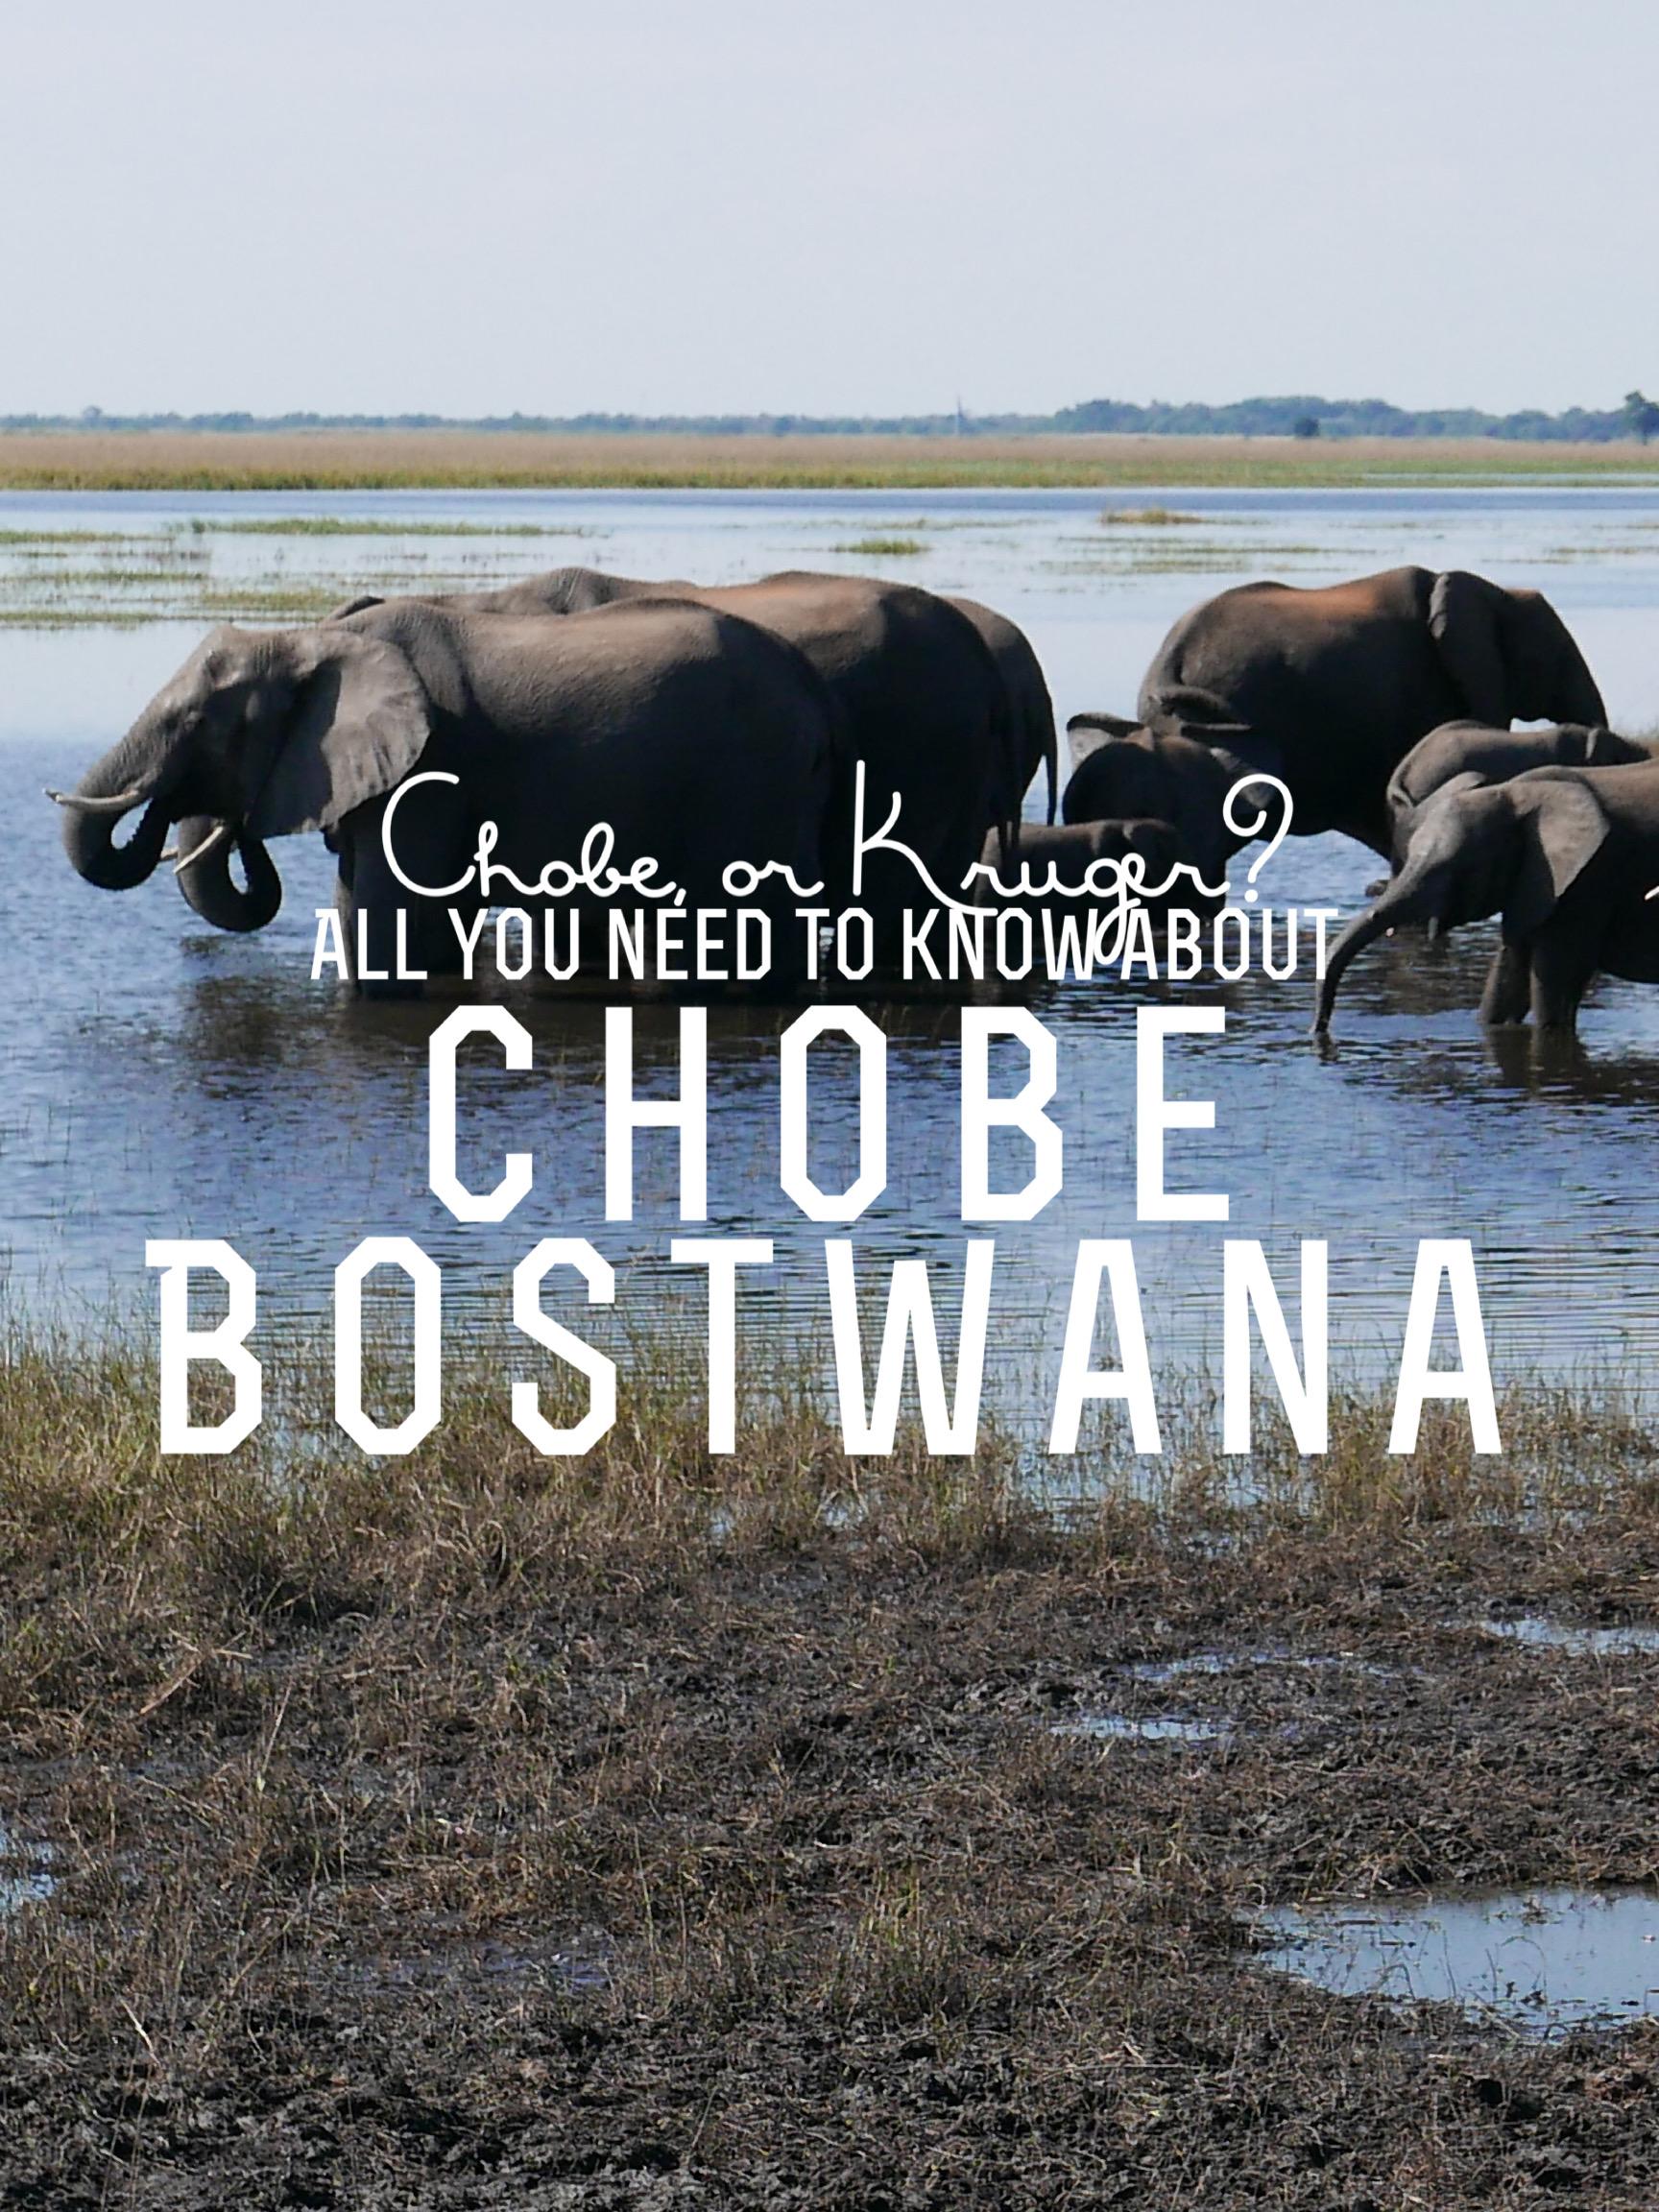 Chobe, or… Kruger?